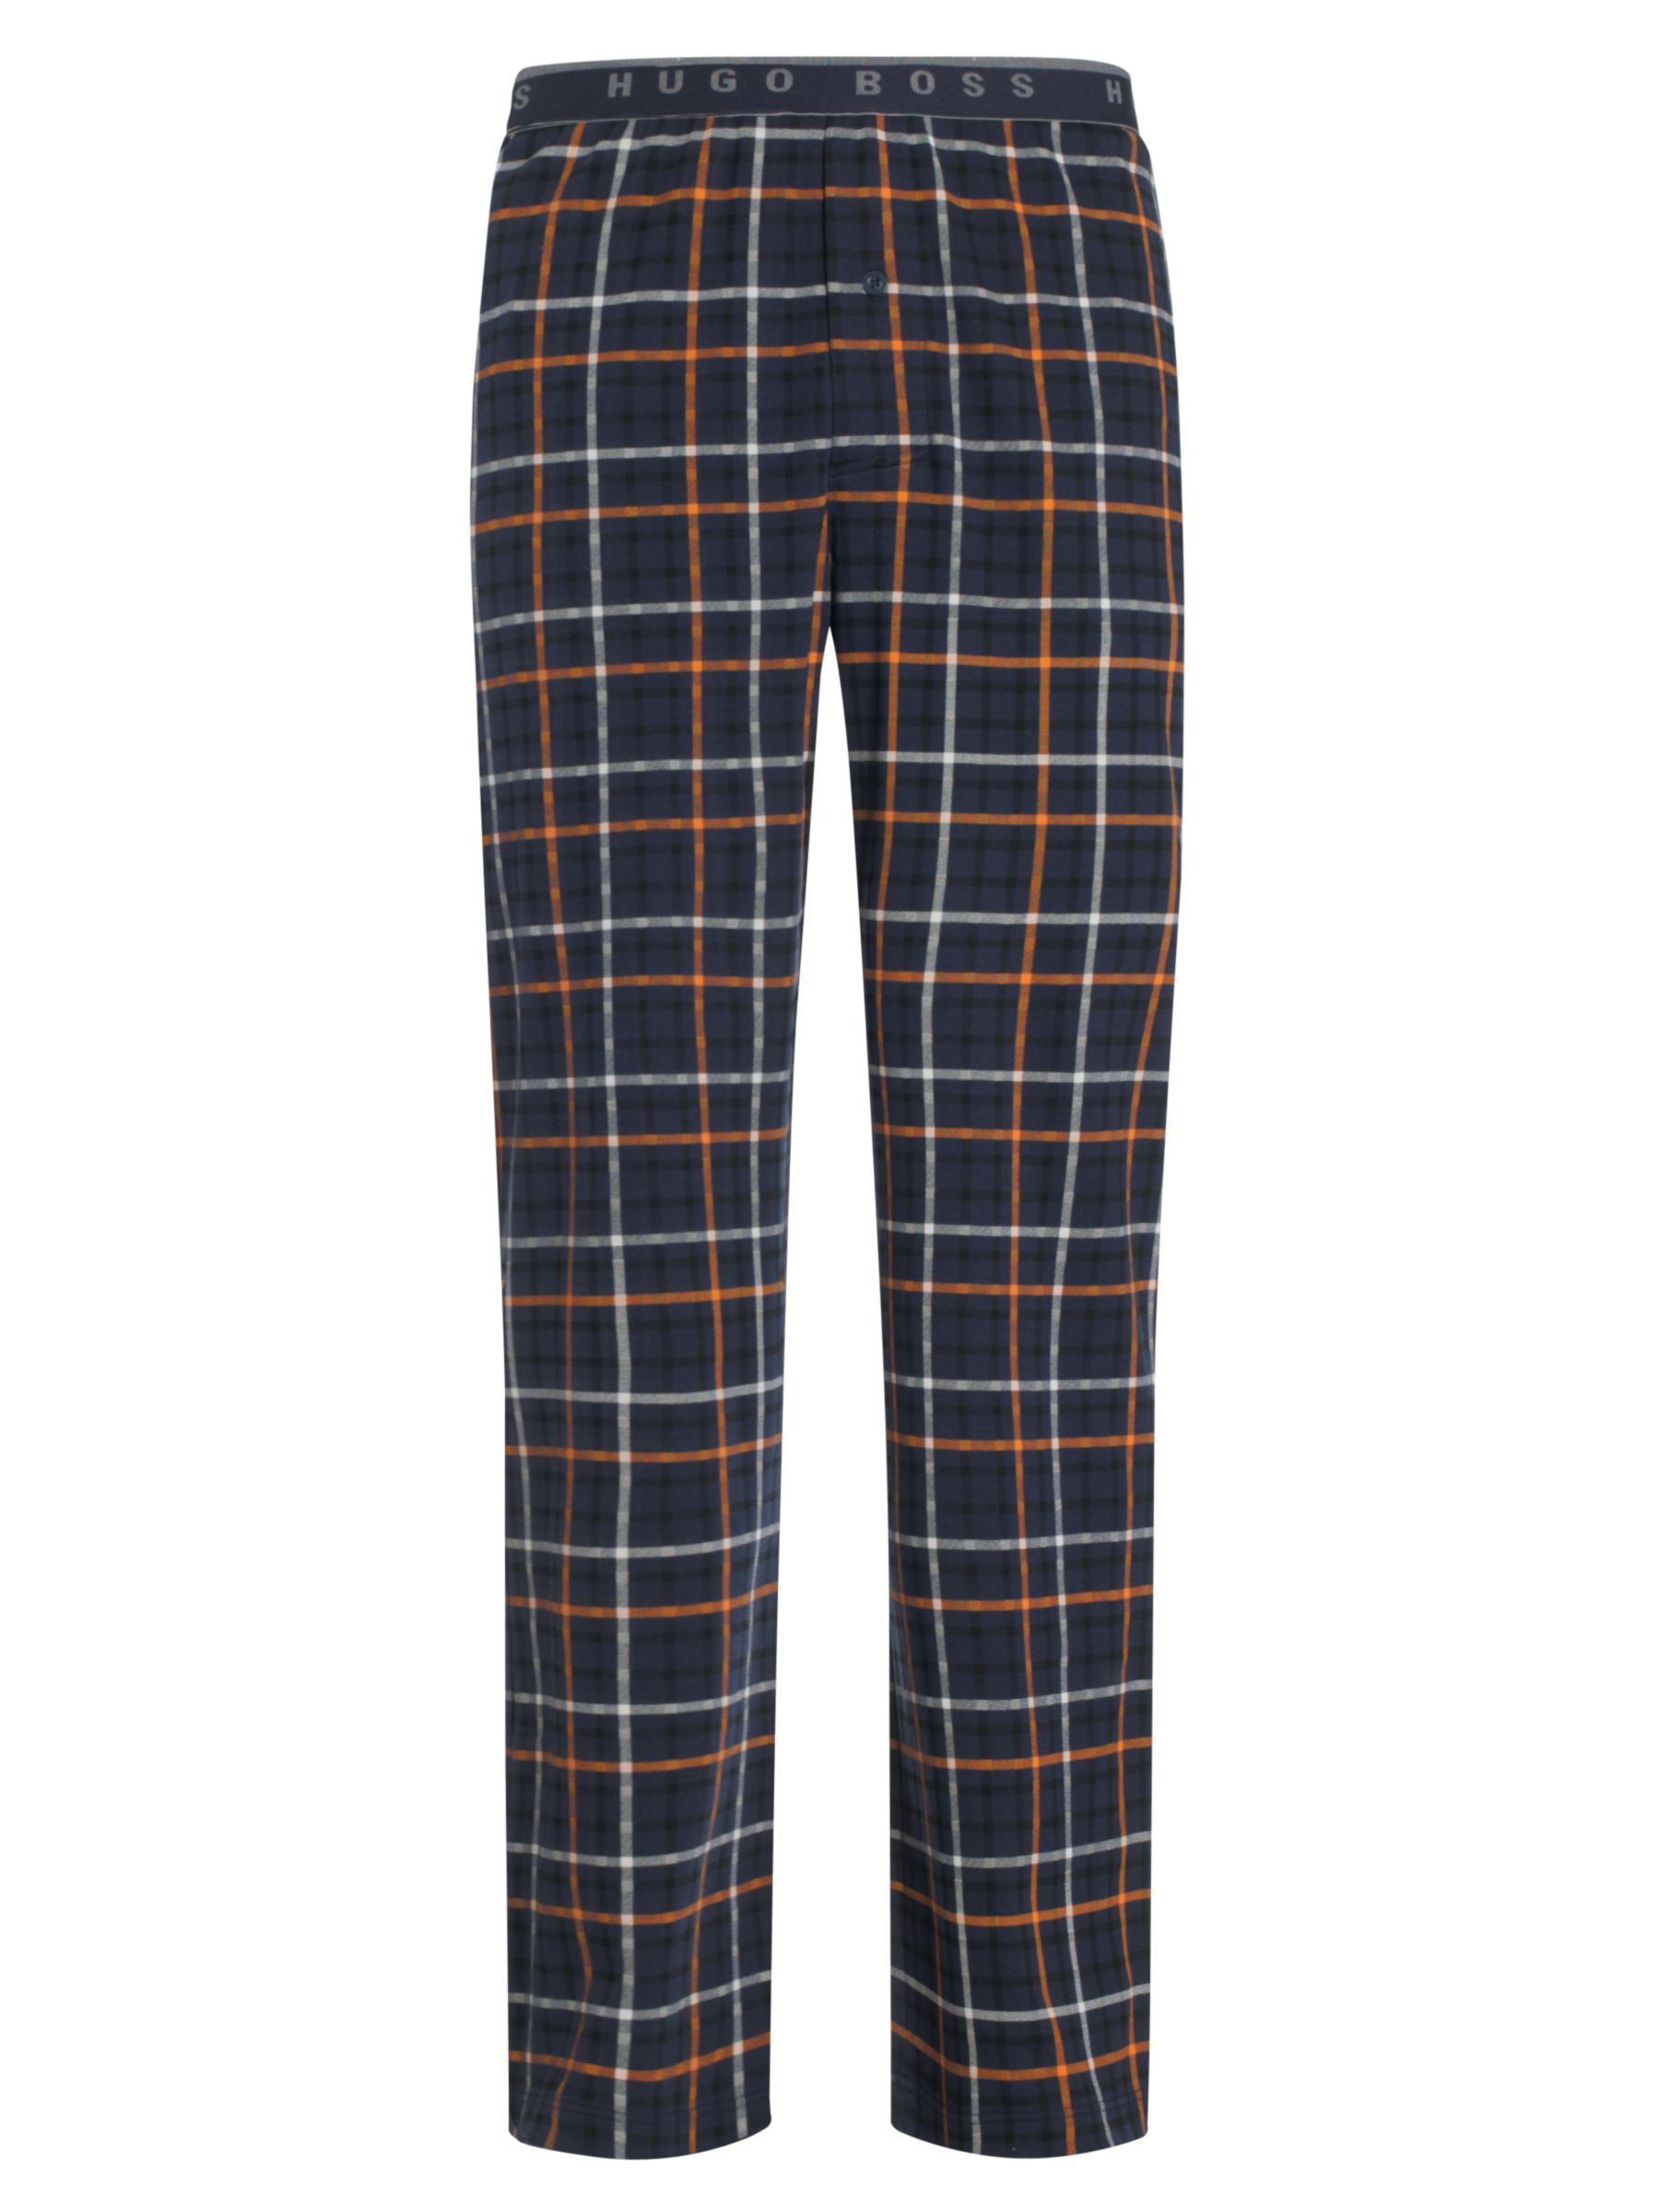 Hugo Boss Inno Lounge Pants, Orange/Blue